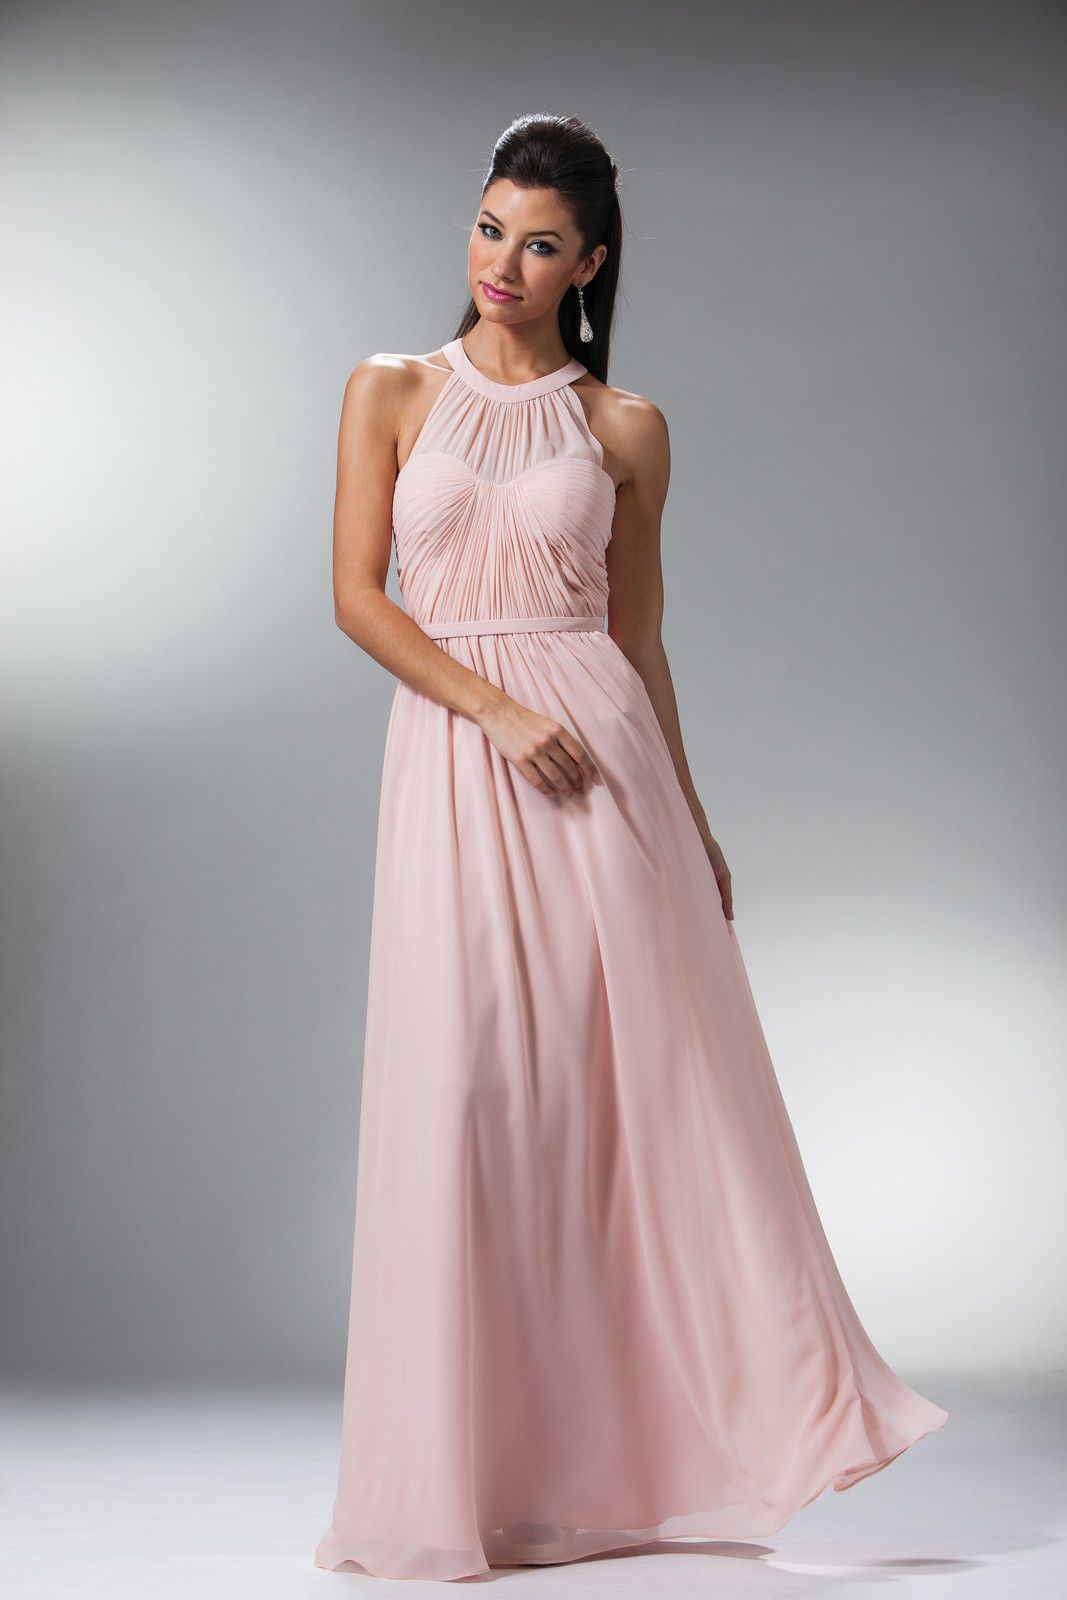 Long prom floor length dress gown evening bridesmaid sleeveless